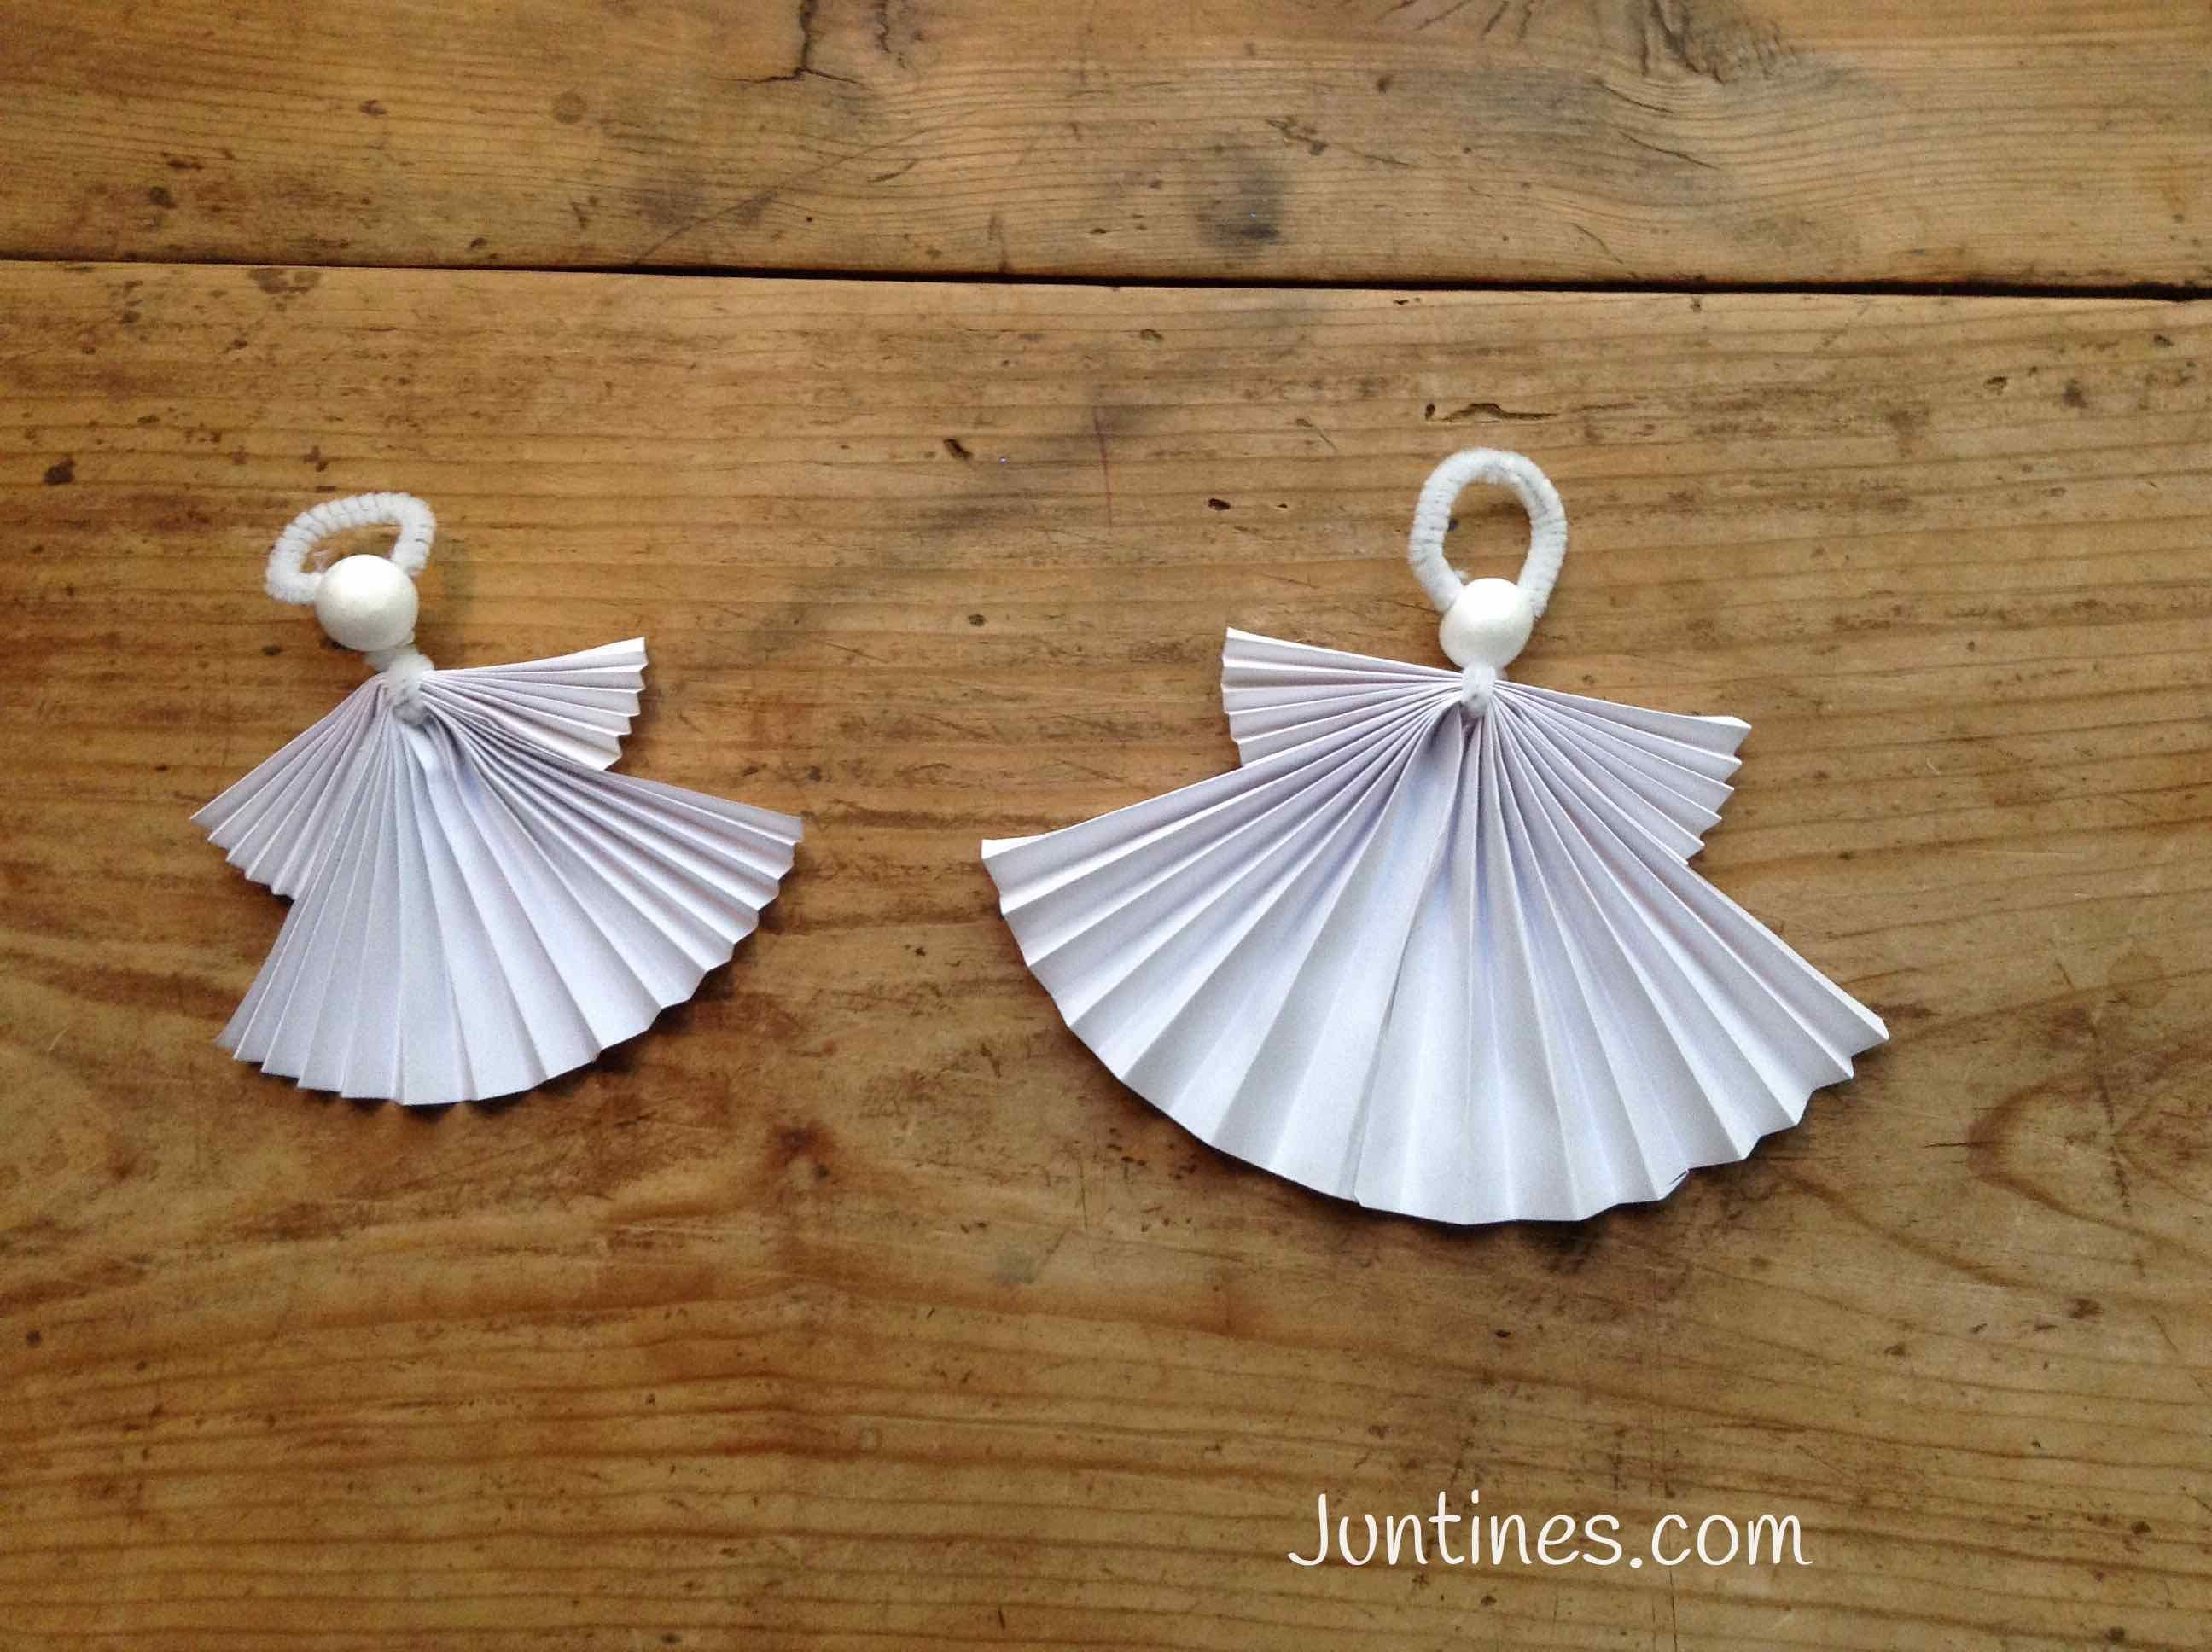 Origami for kids origami para ni os origami angel - Adornos navidenos ninos ...